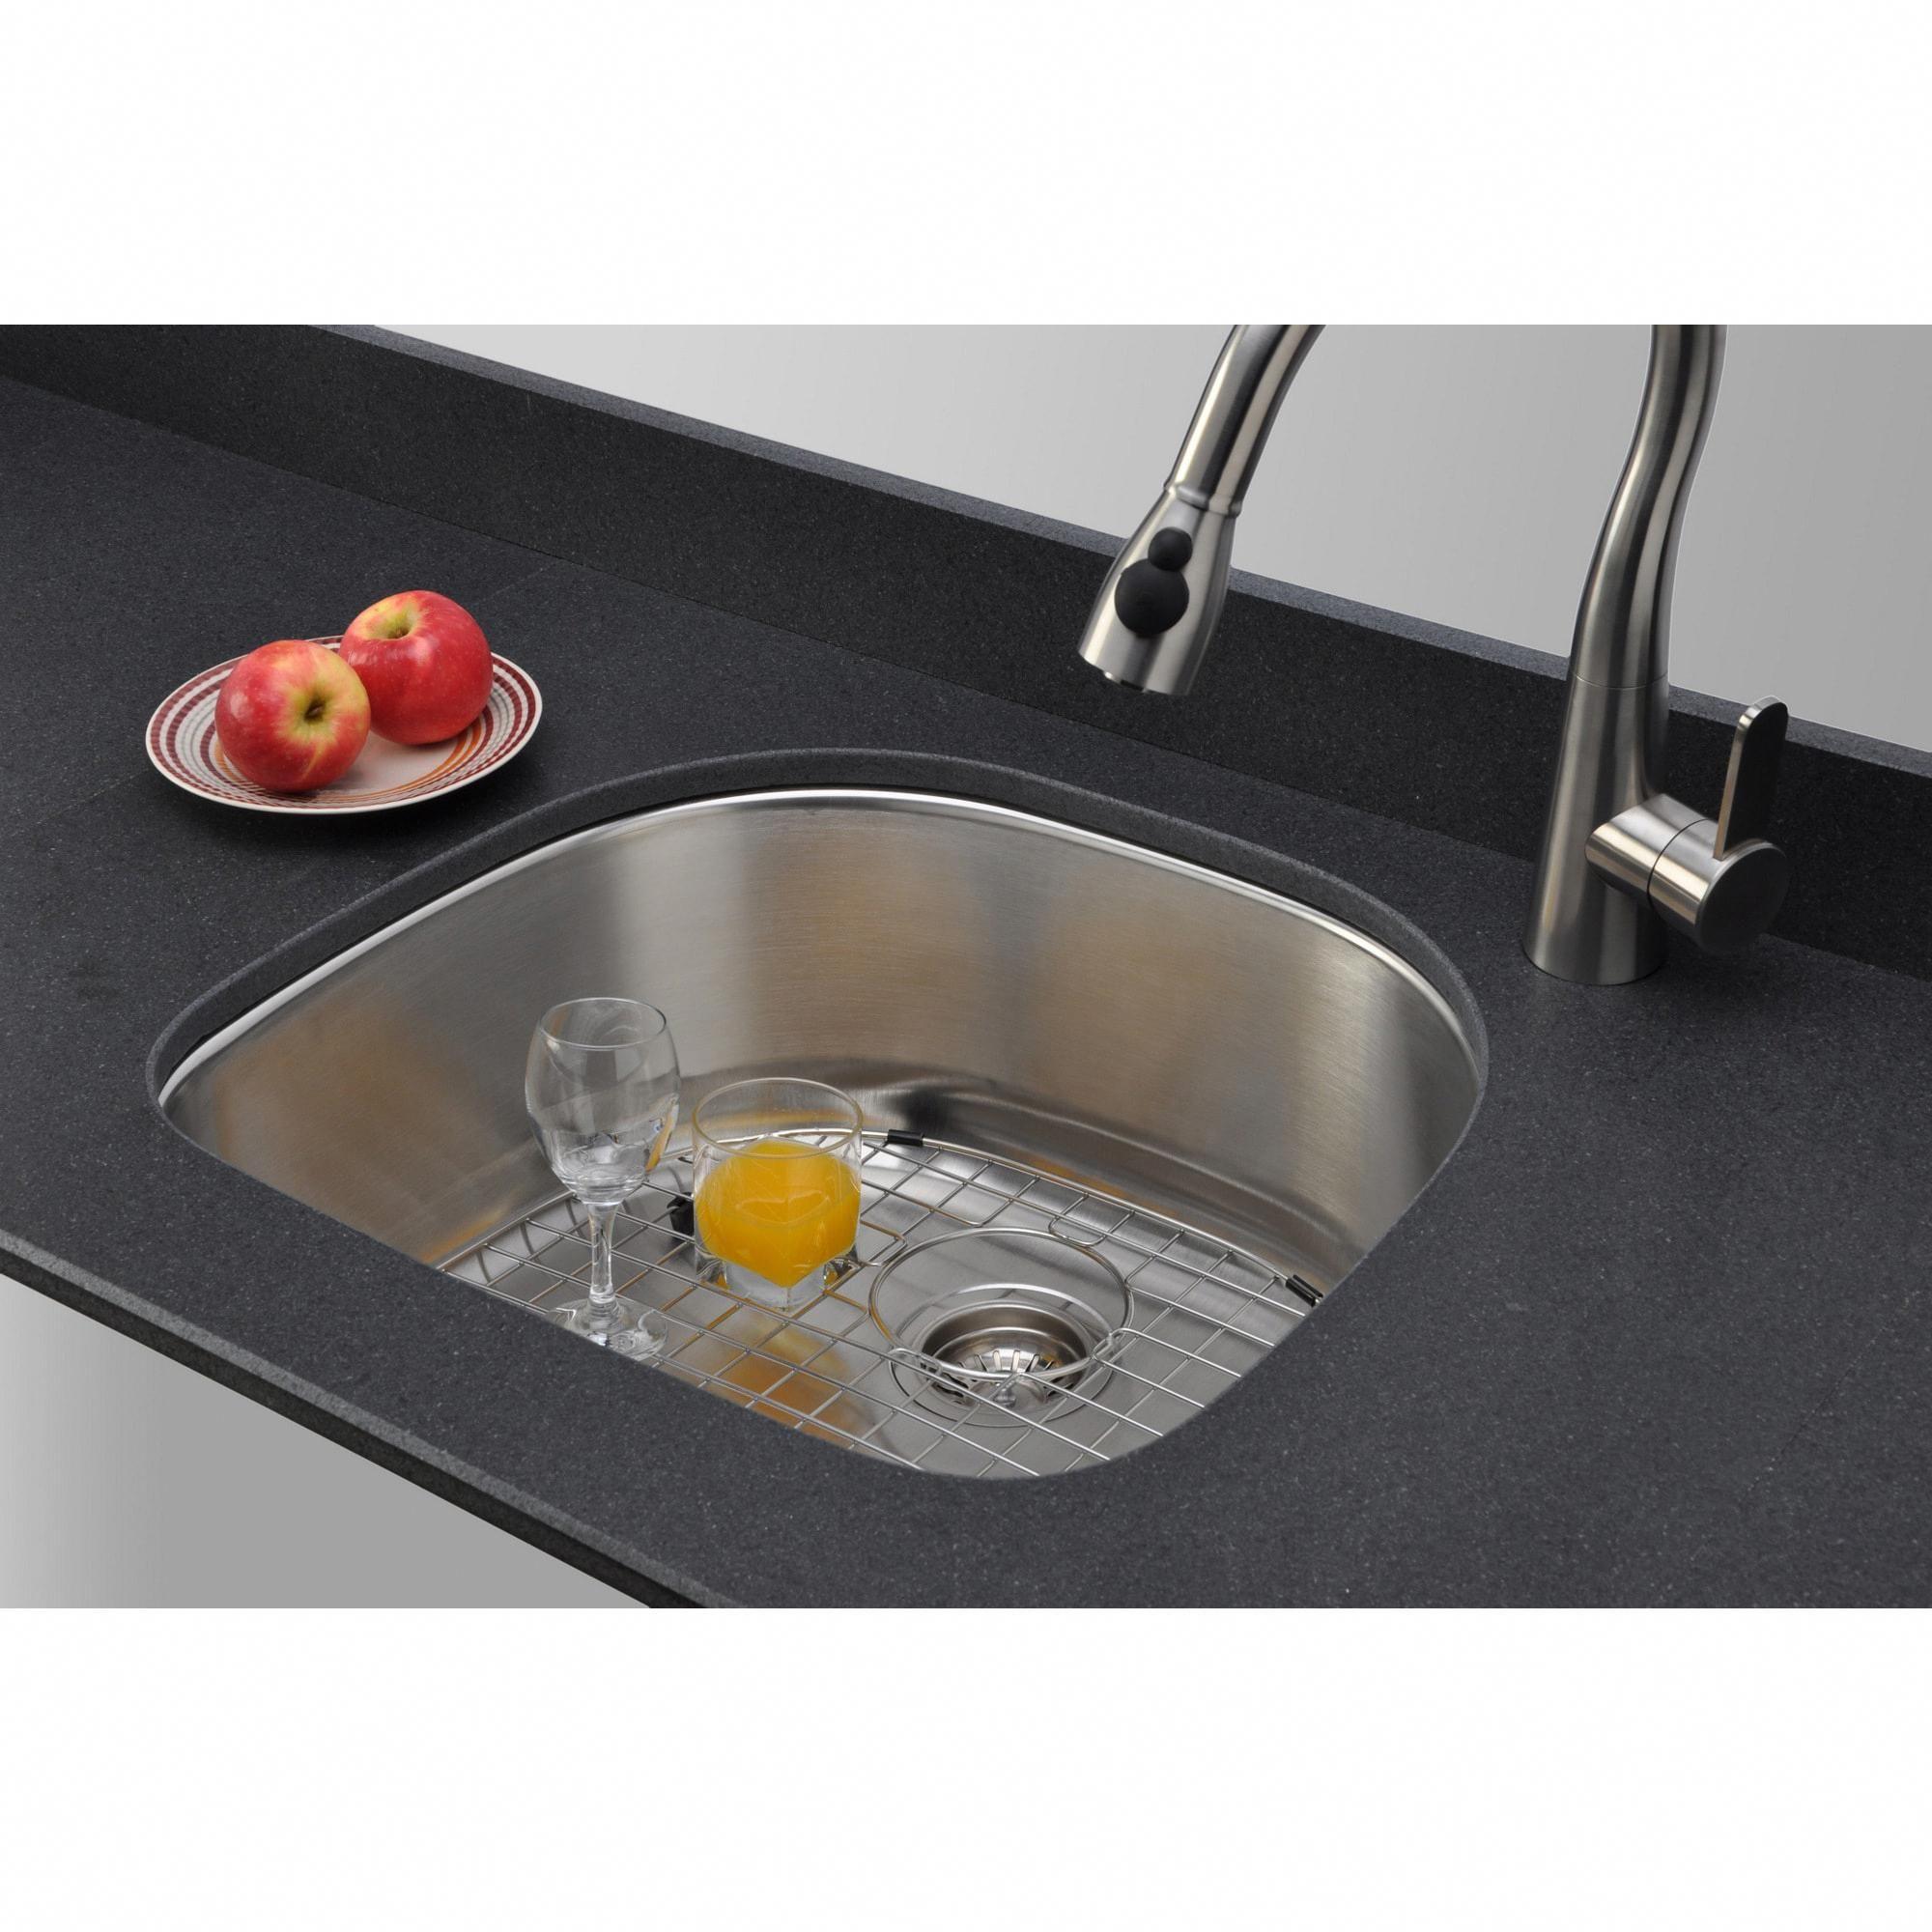 Wells Sinkware Craftsmen Series 24 Inch 16 Gauge Undermount D Shape Single Bowl Stainless Steel Silver Kitchen Sin Sink Kitchen Sink Single Bowl Kitchen Sink